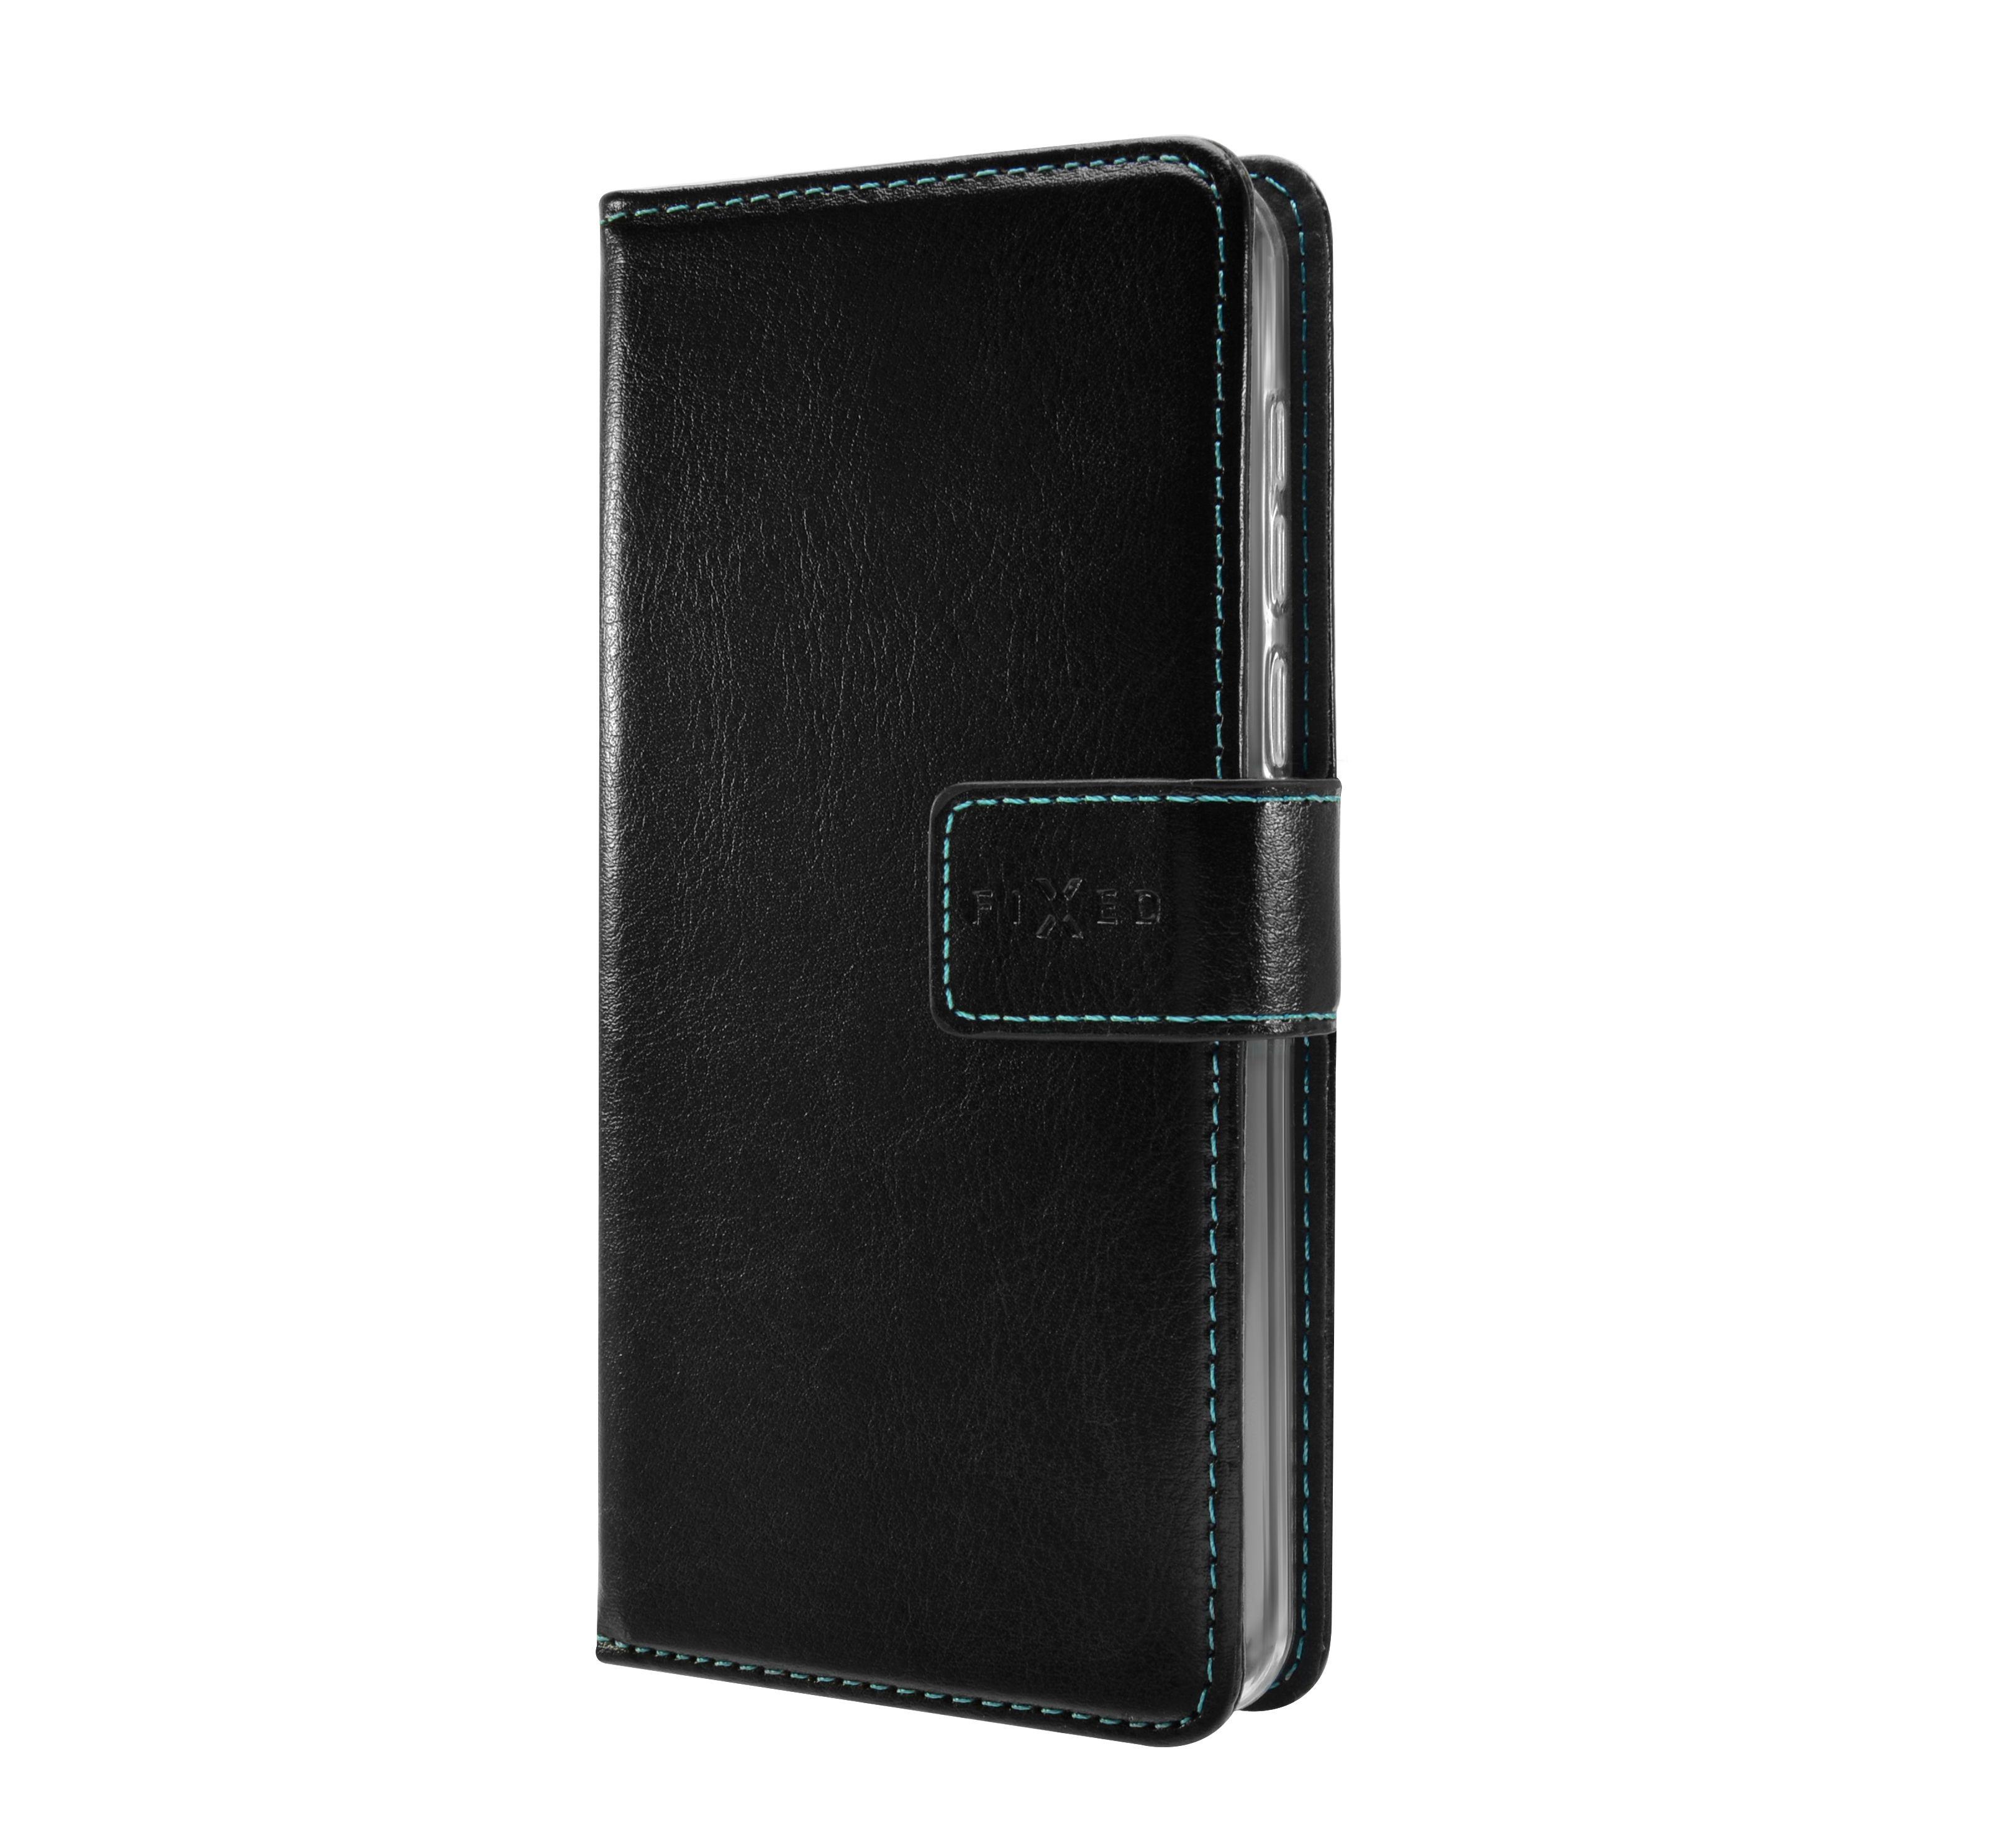 Pouzdro typu kniha FIXED Opus pro Huawei P20 Lite (2019), černé